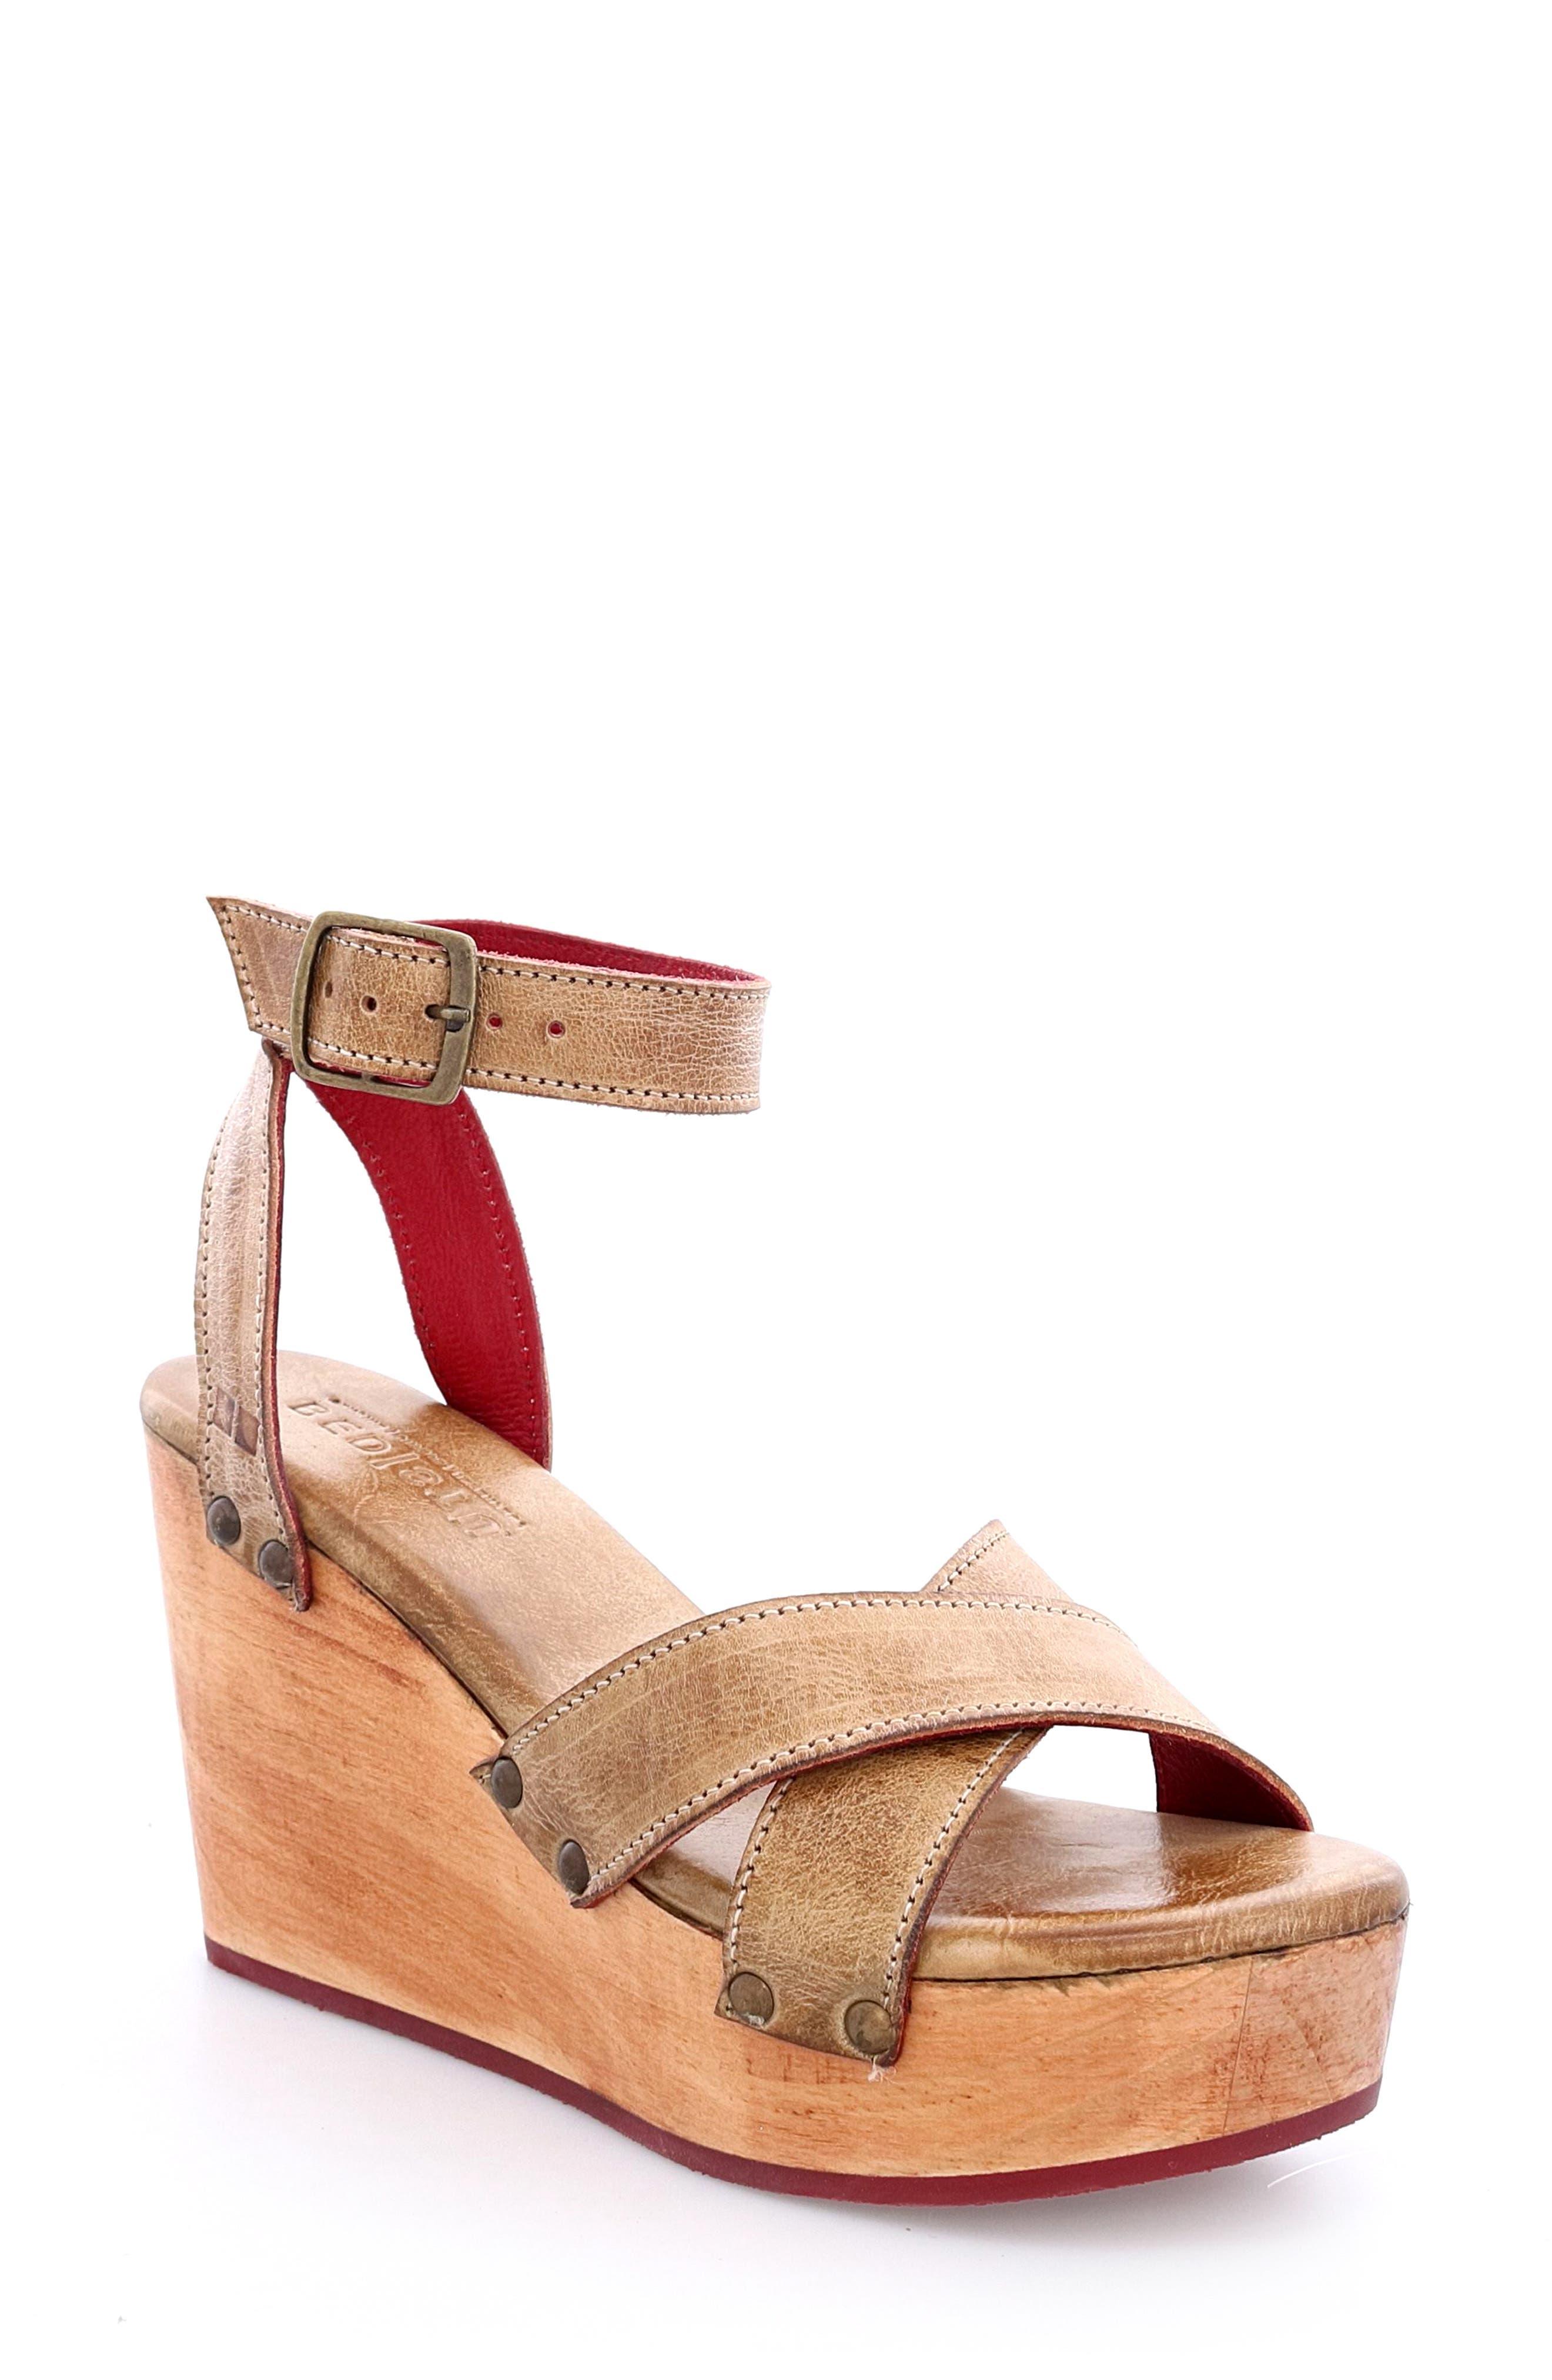 Grettel Platform Wedge Sandal